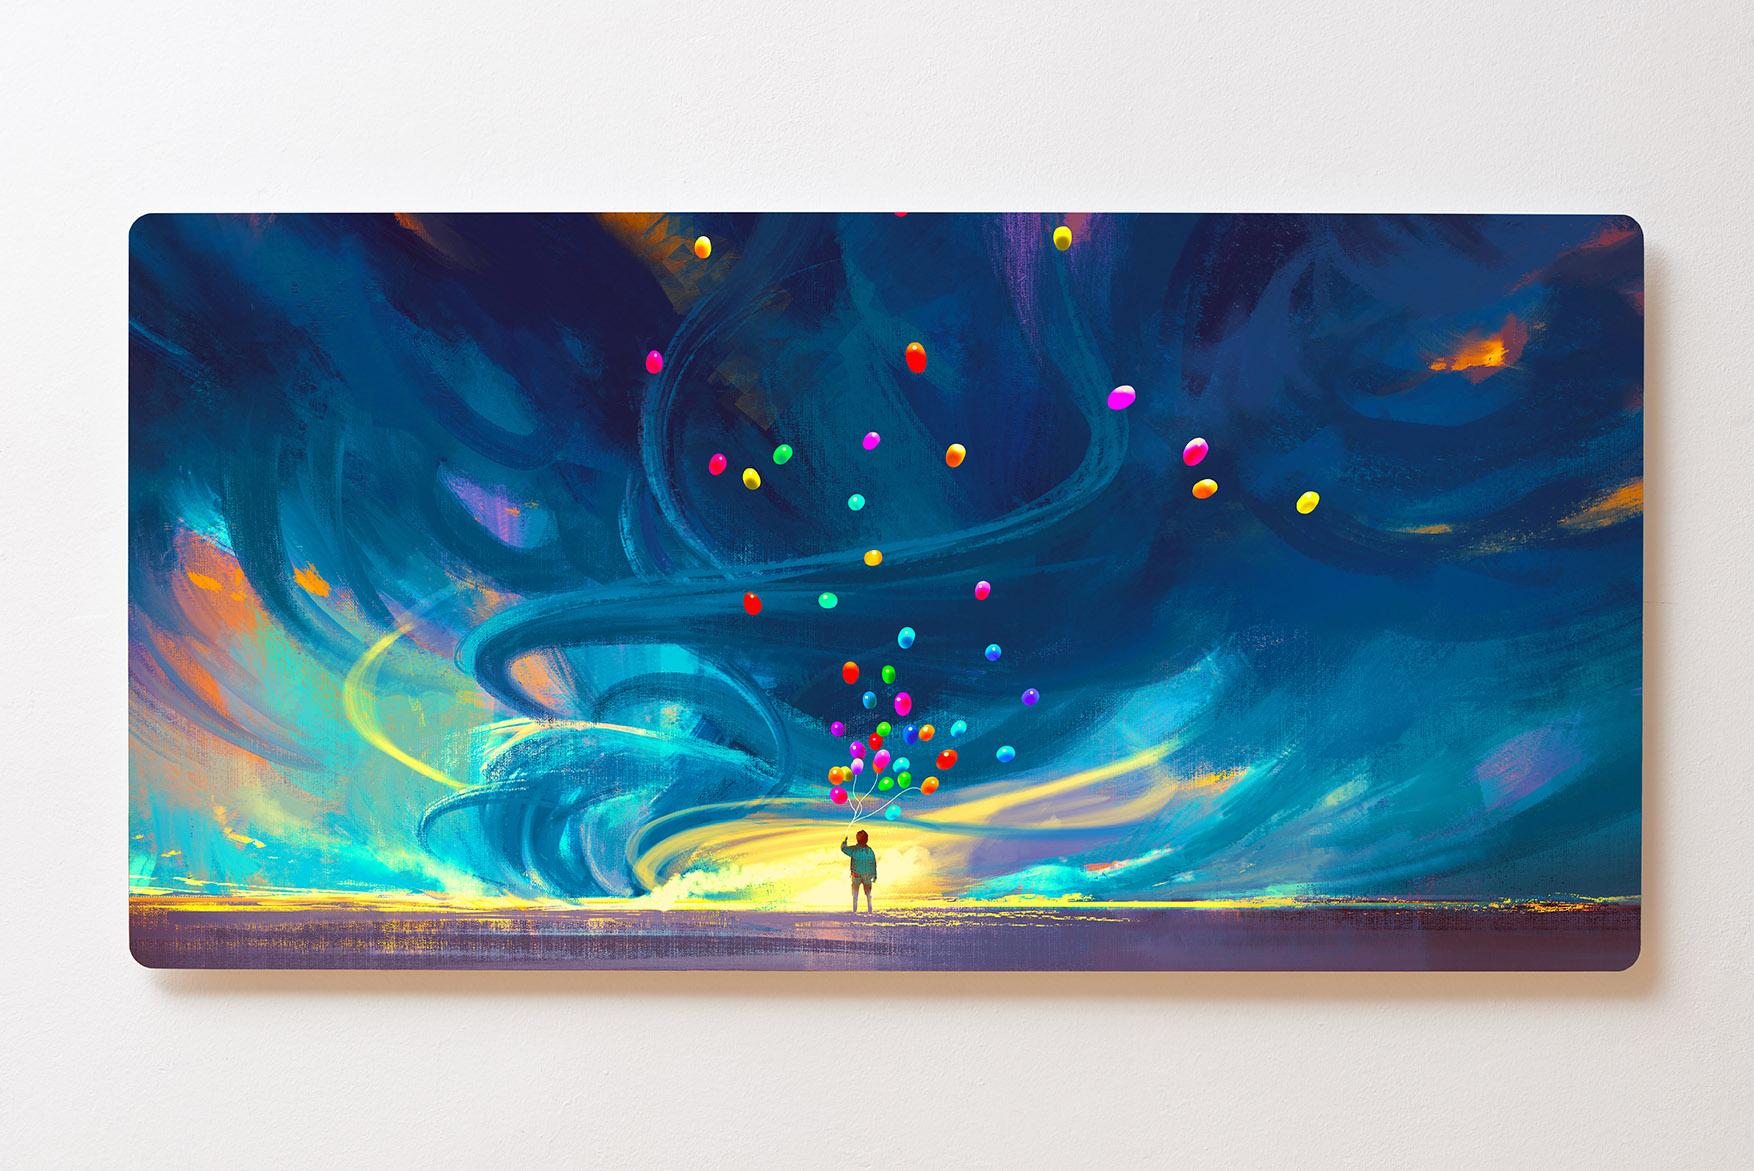 Magnettafel BACKLIGHT 120x60cm Motiv-Wandbild M118 Gemälde Sternenhimmel